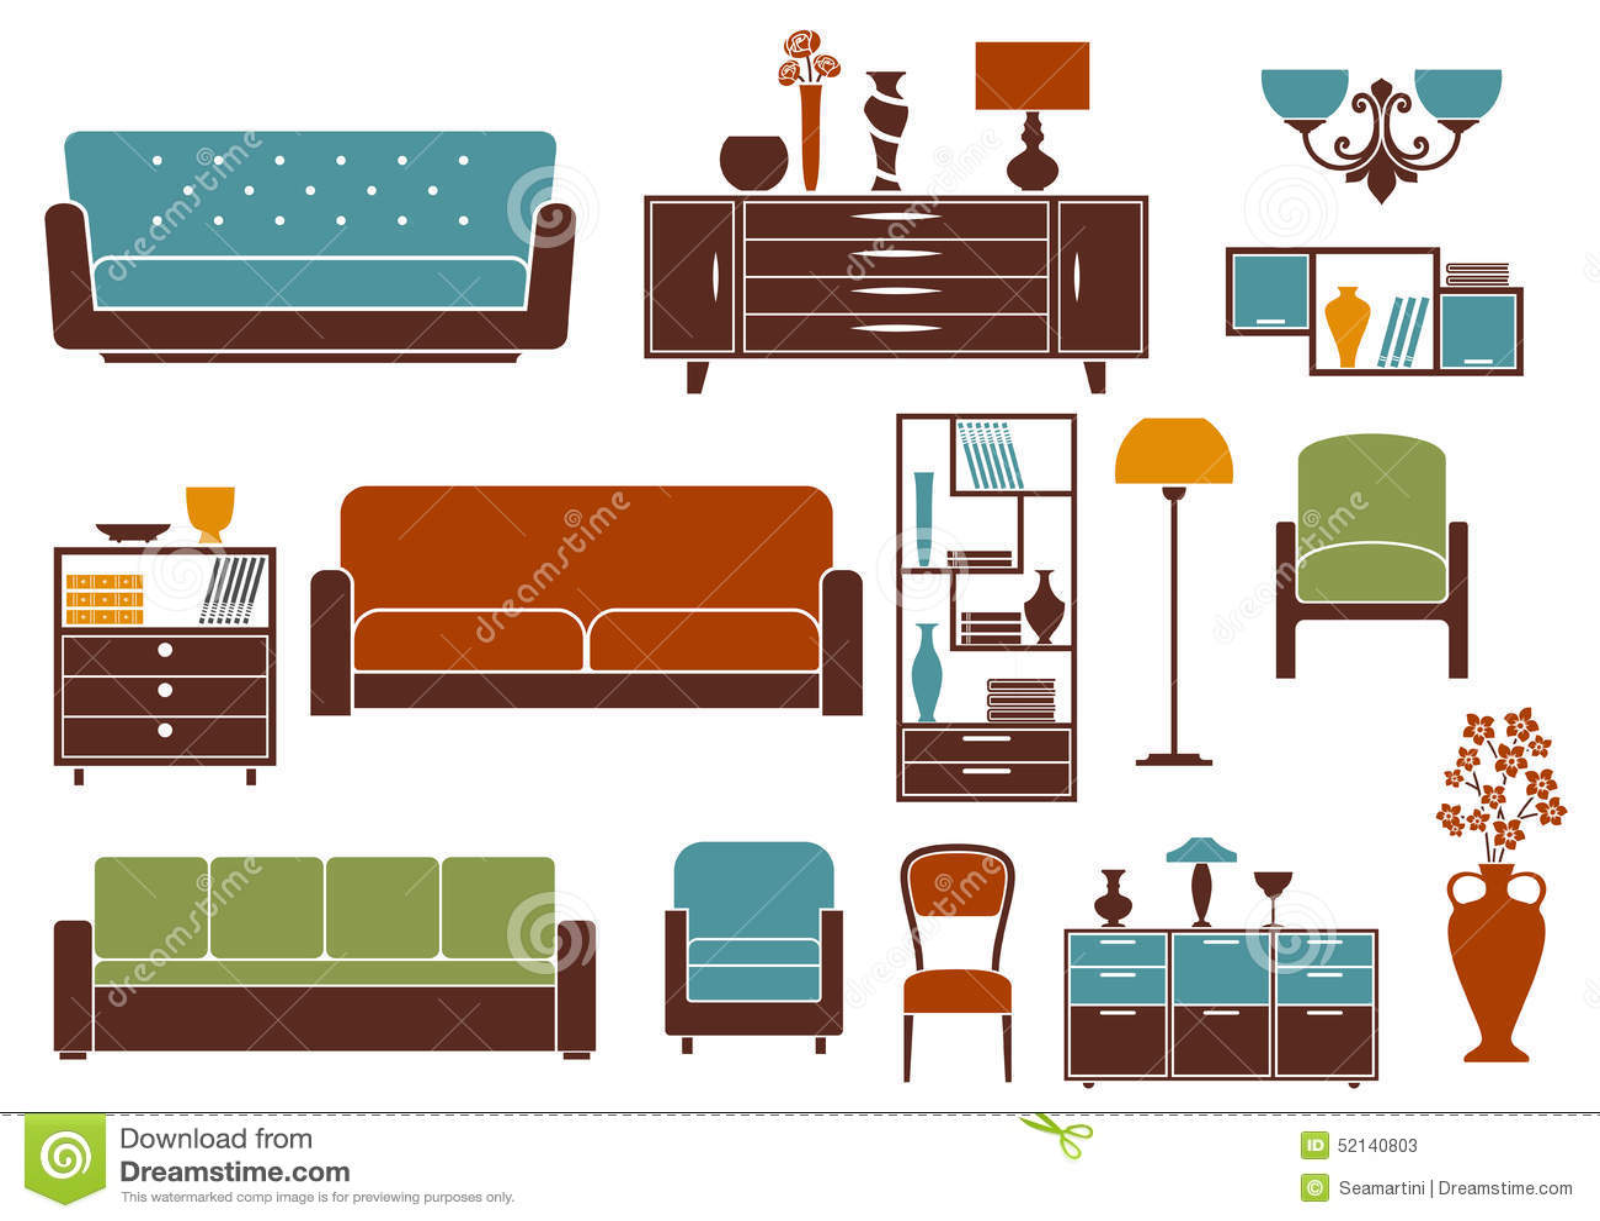 Muebles vectorizados para planos obtenga ideas dise o de - Muebles para apartamentos ...